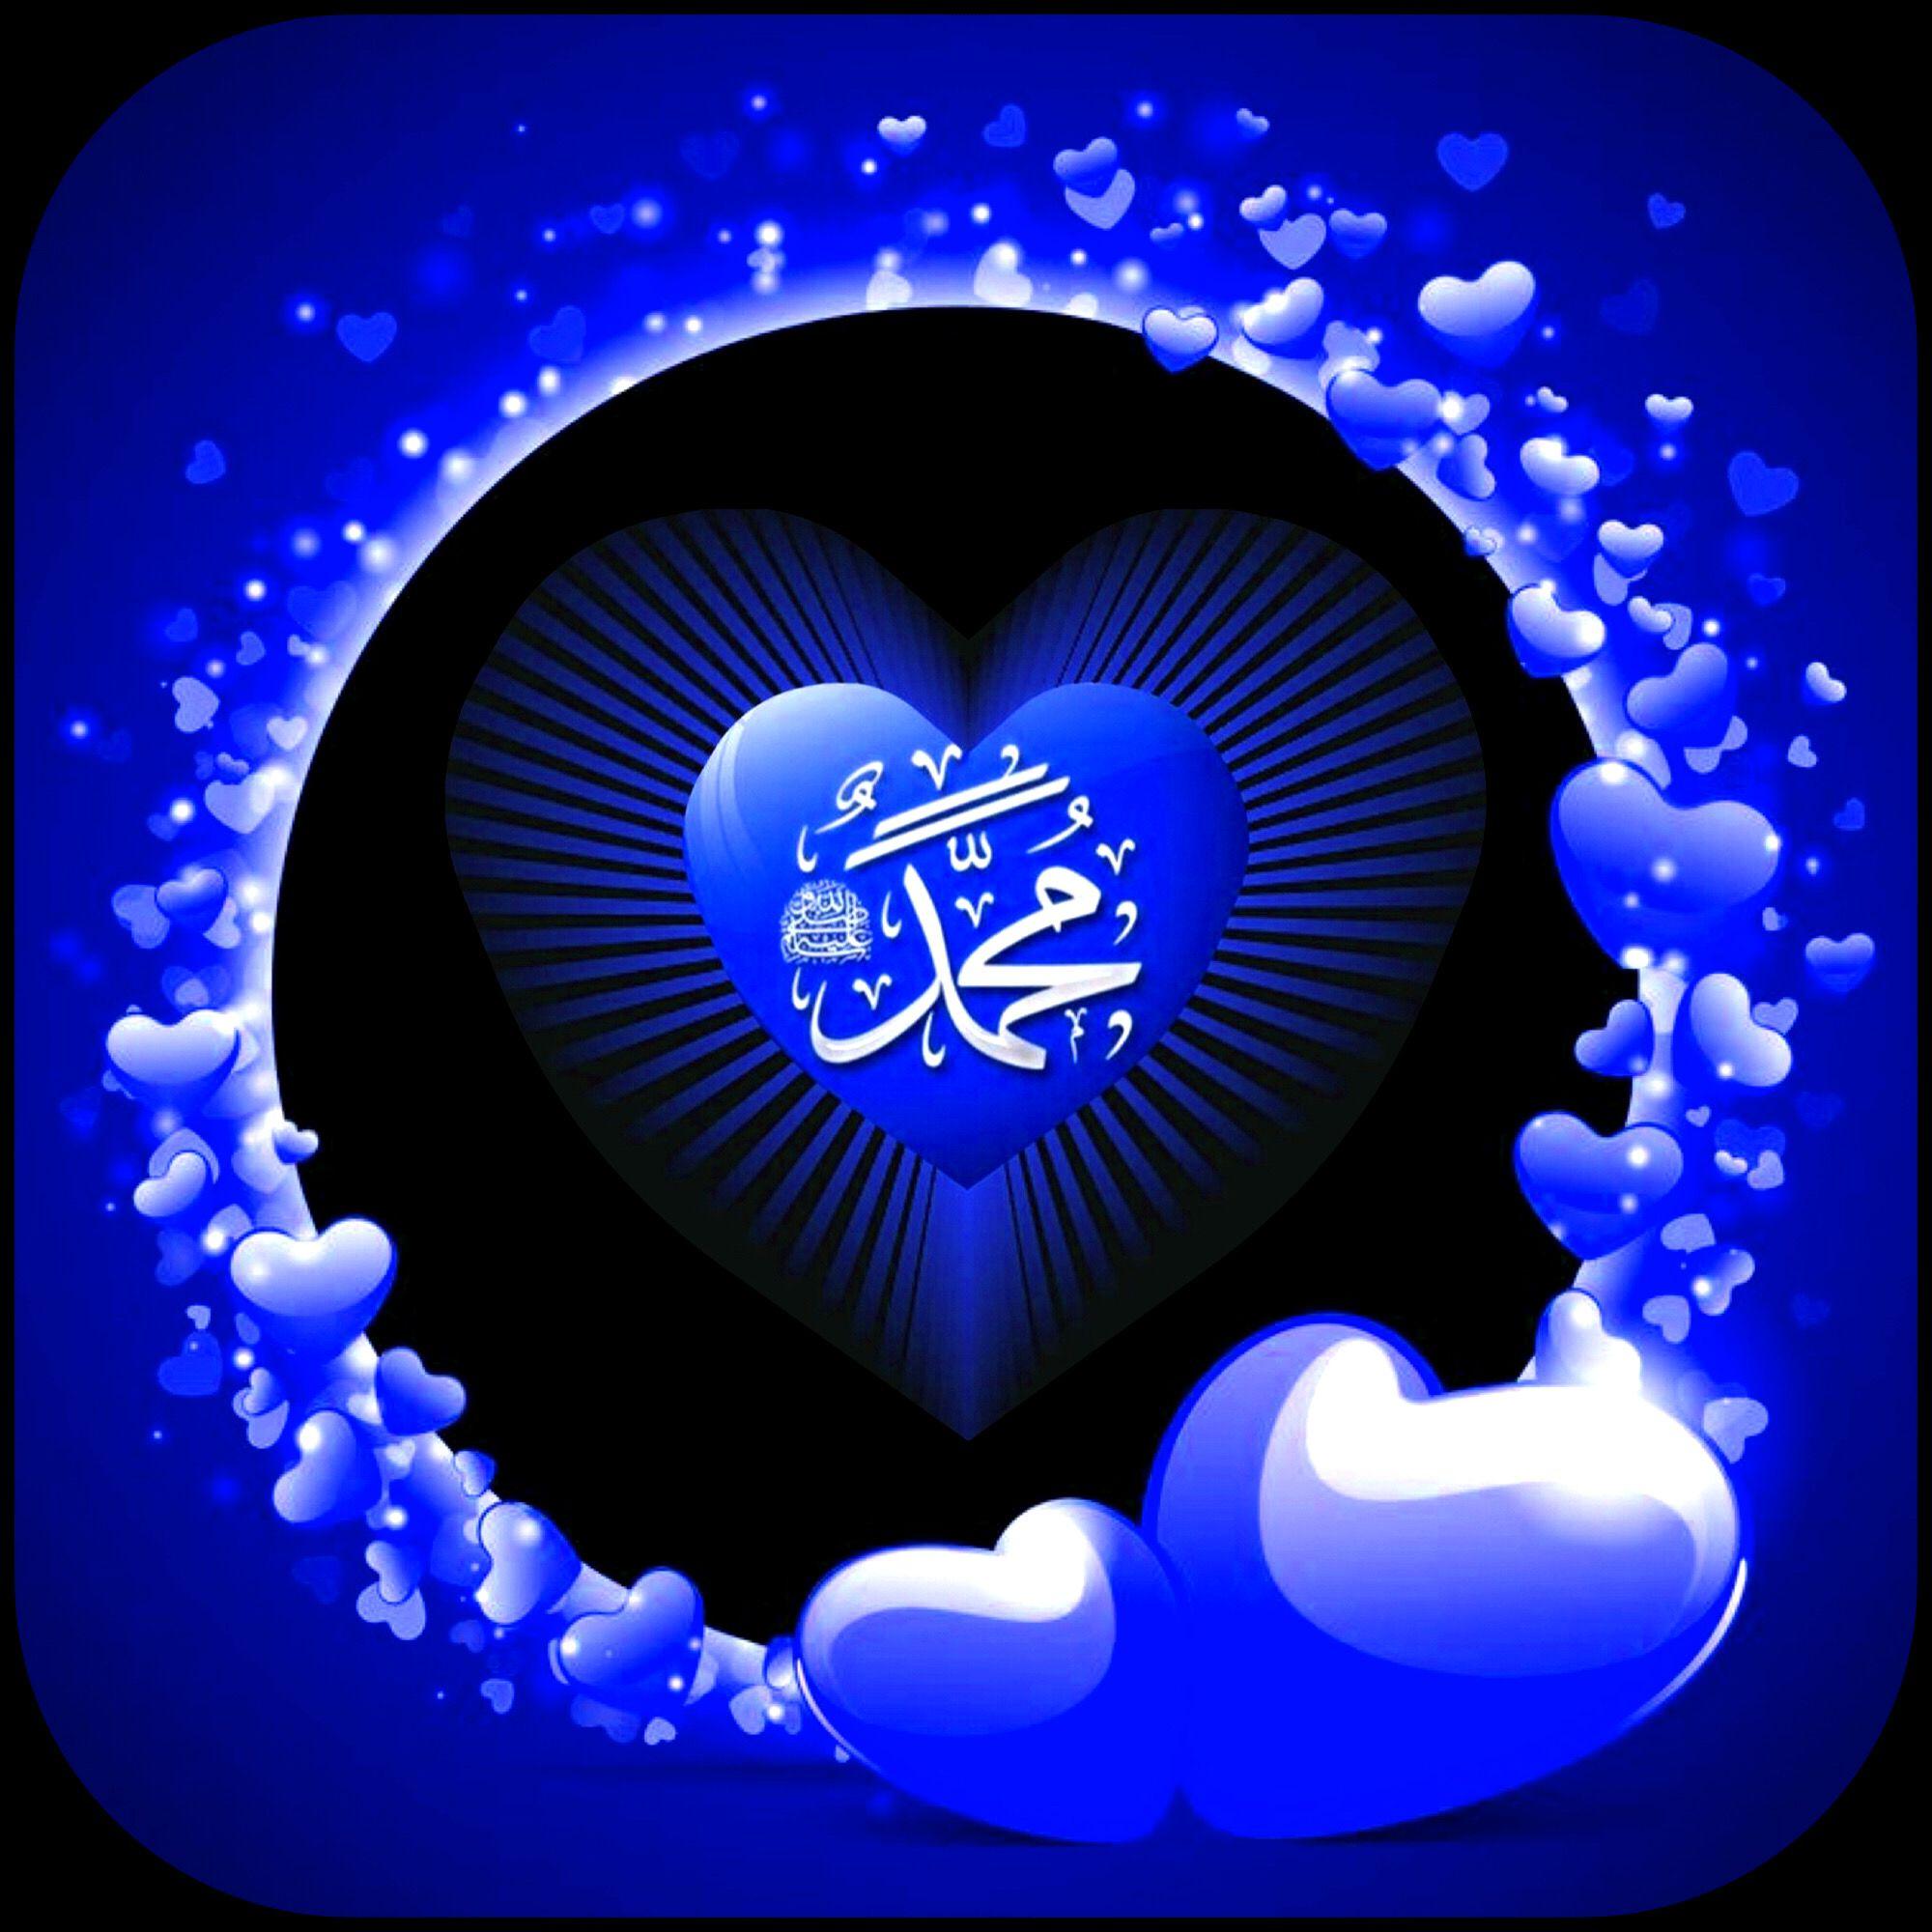 Pin By Rizwan Abid On Allah Islamic Wallpaper Islamic Pictures Lock Screen Wallpaper